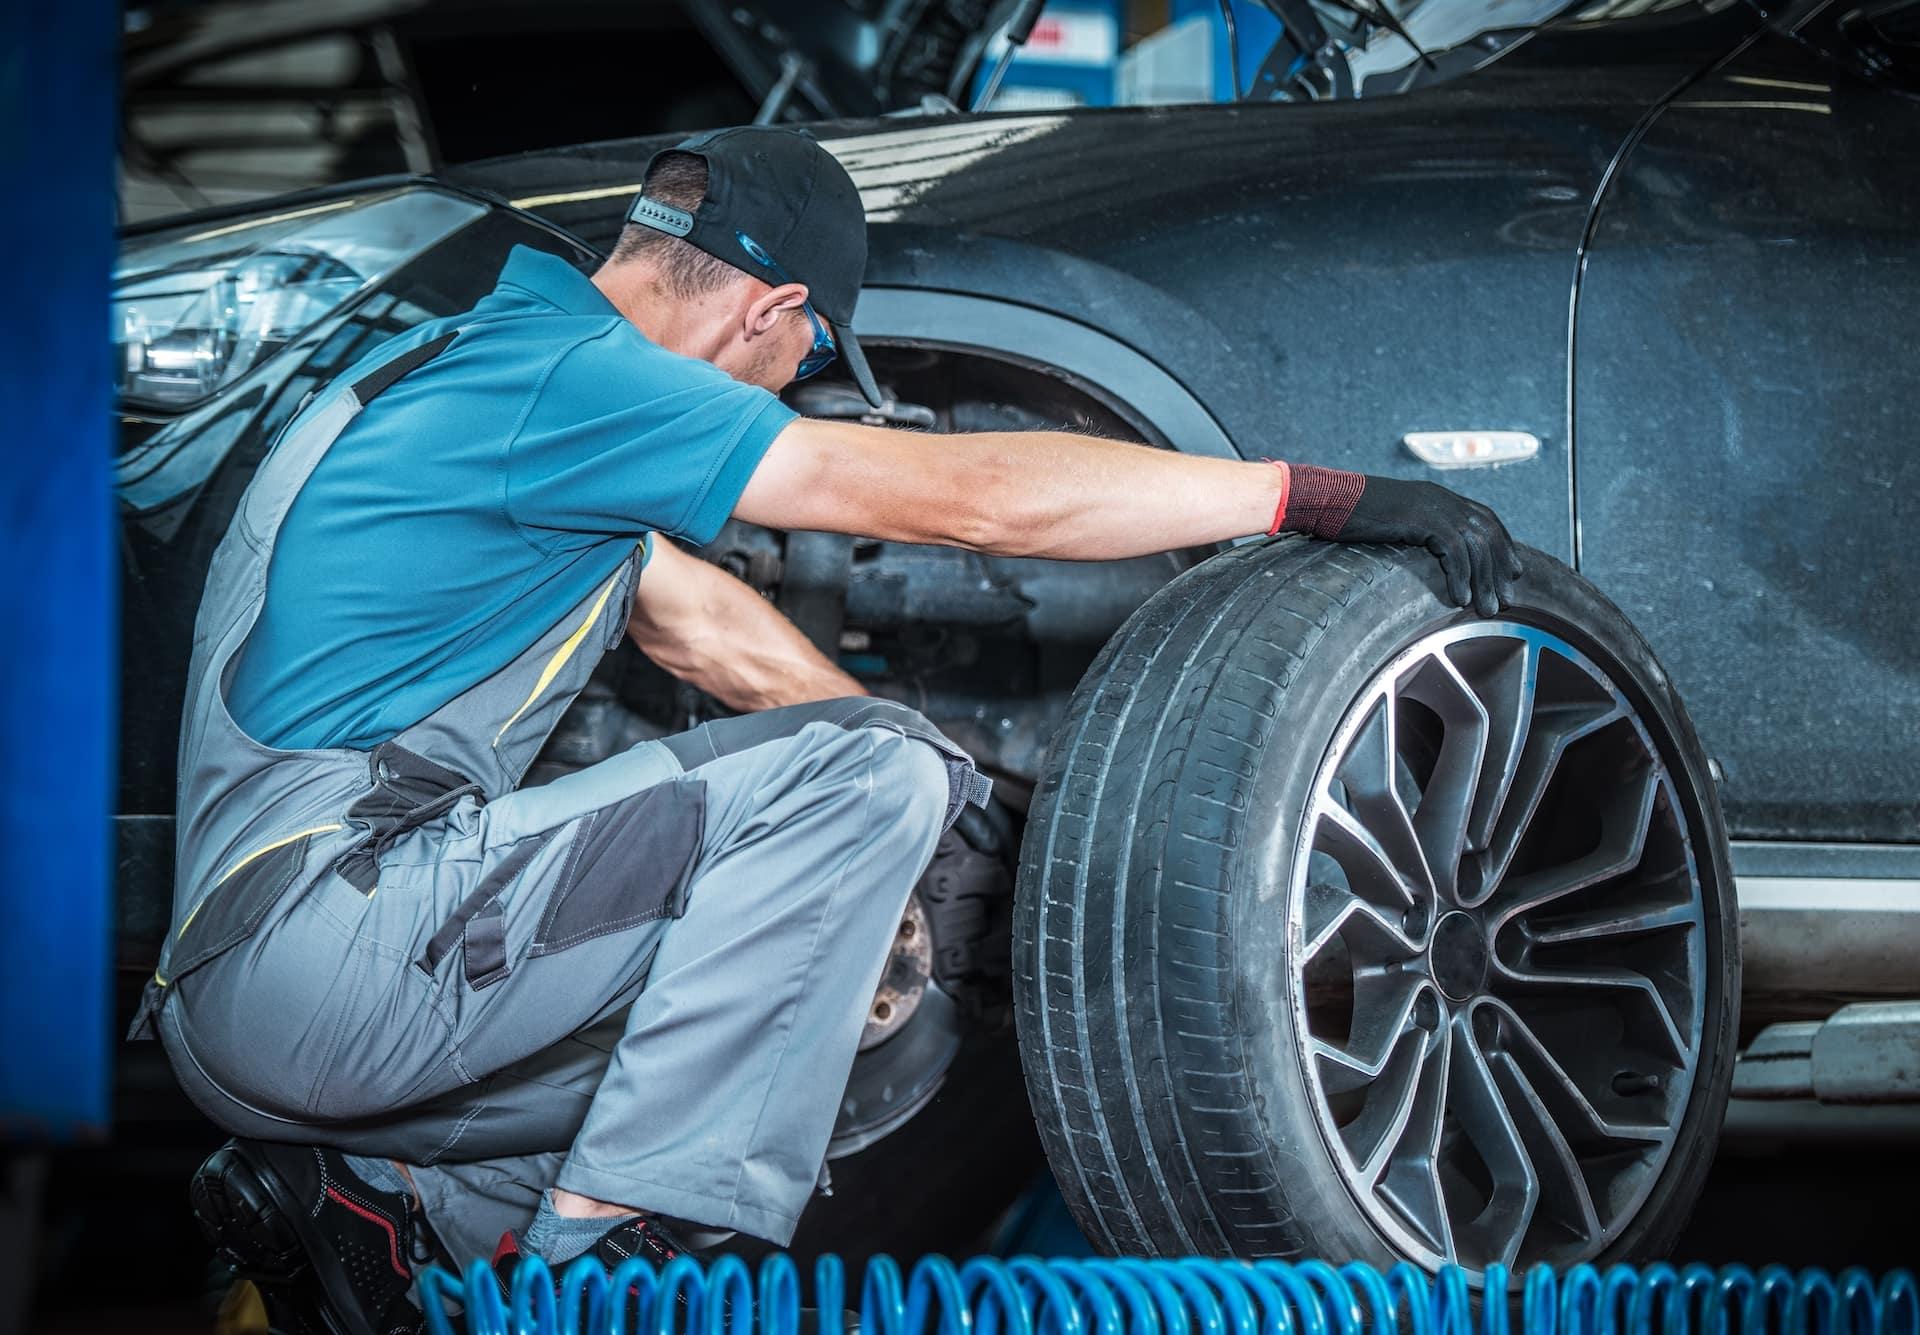 Mechanic replacing tire | Bennett Maserati of Allentown is a Car Dealership near East Stroudsburg PA in Allentown